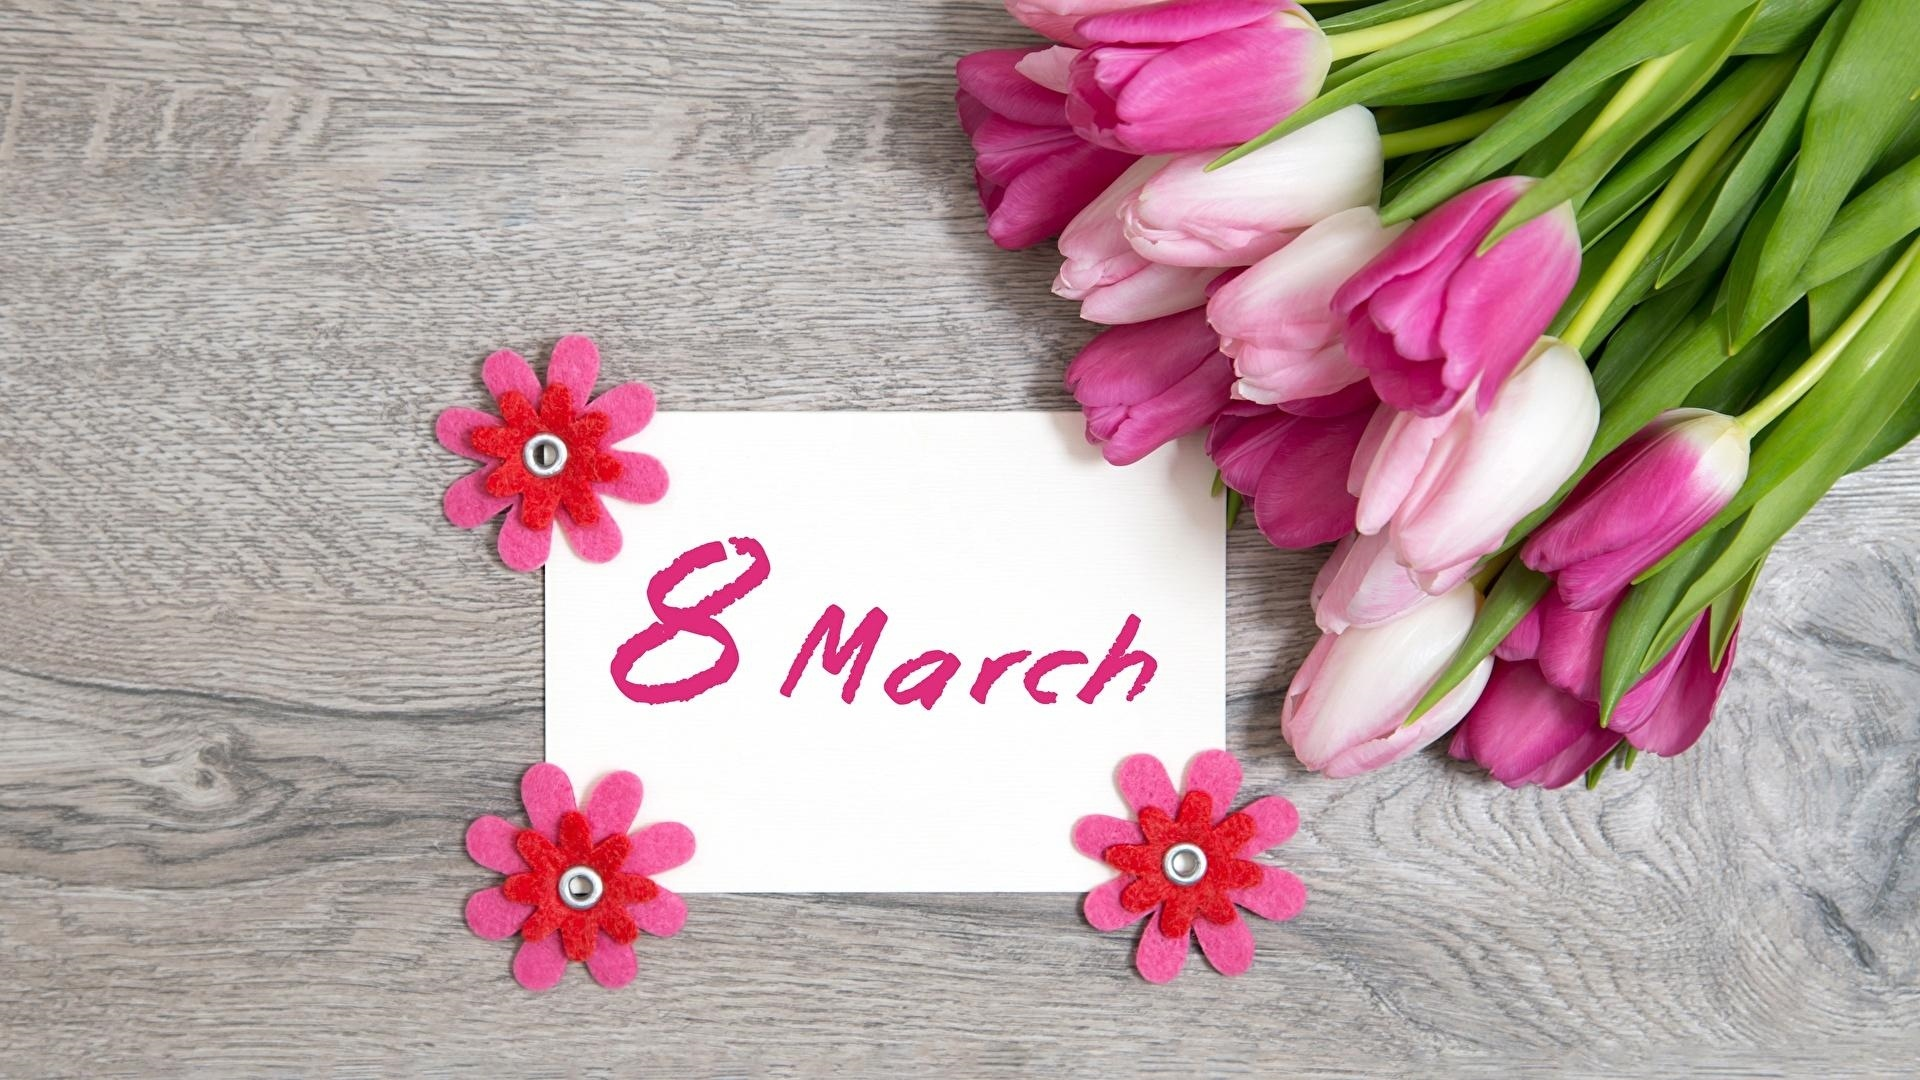 8th March desktop wallpaper hd